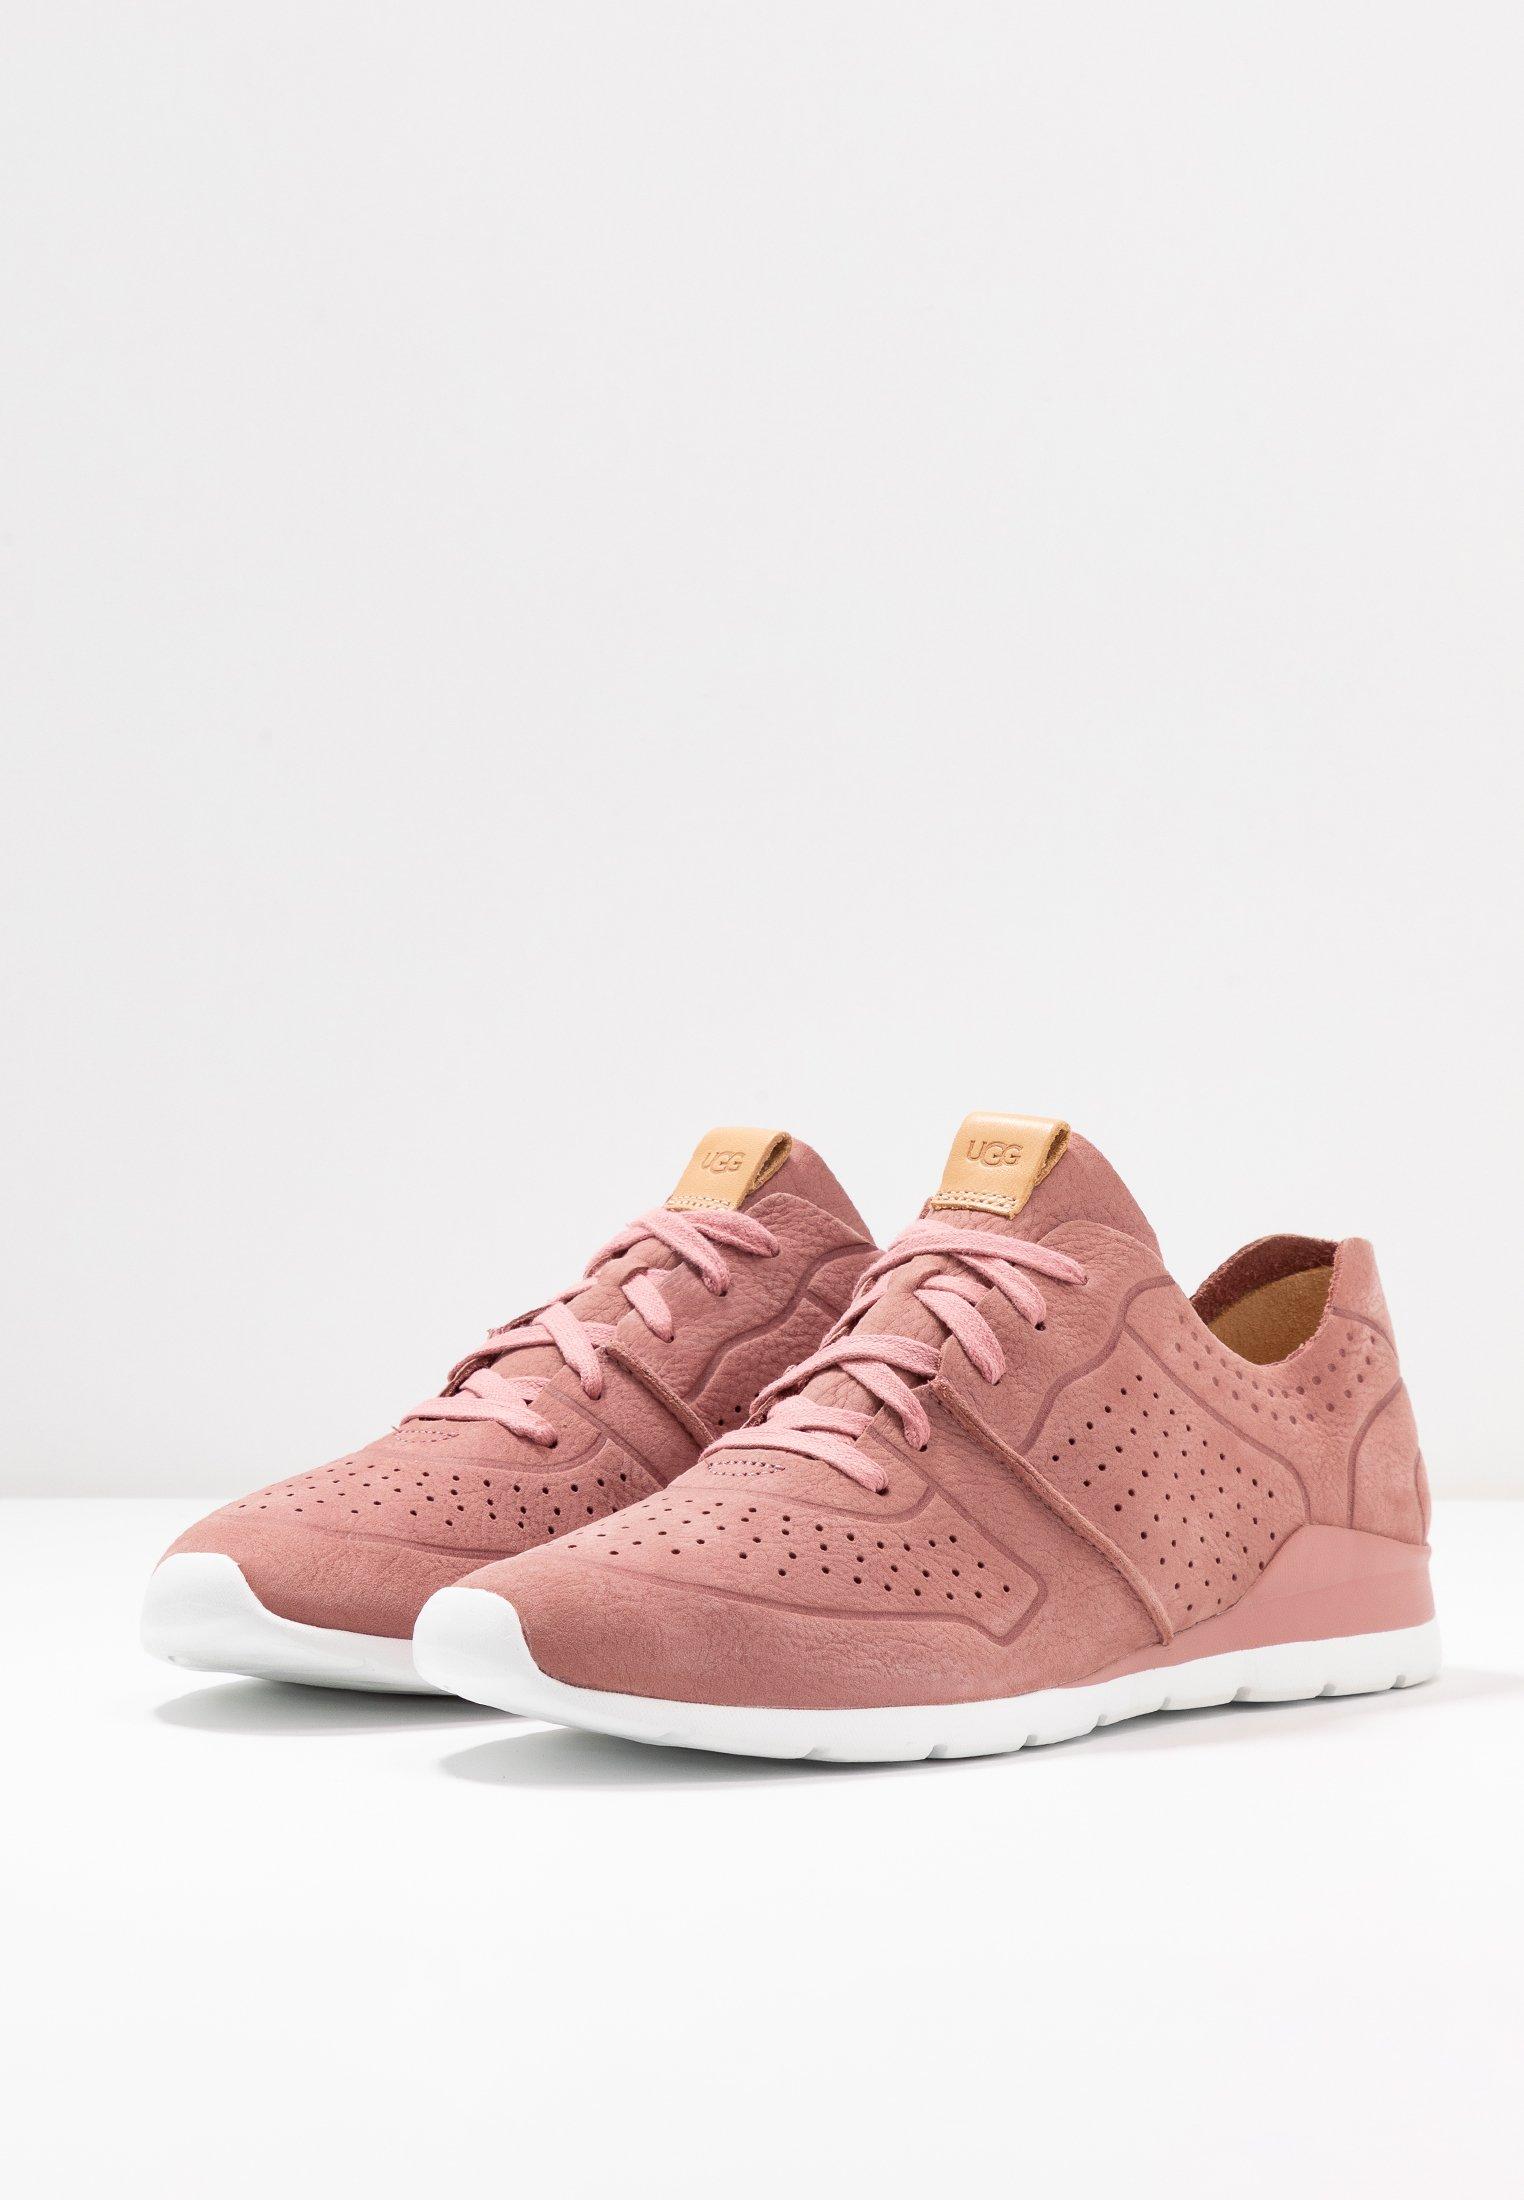 Ugg Tye - Baskets Basses Light Pink